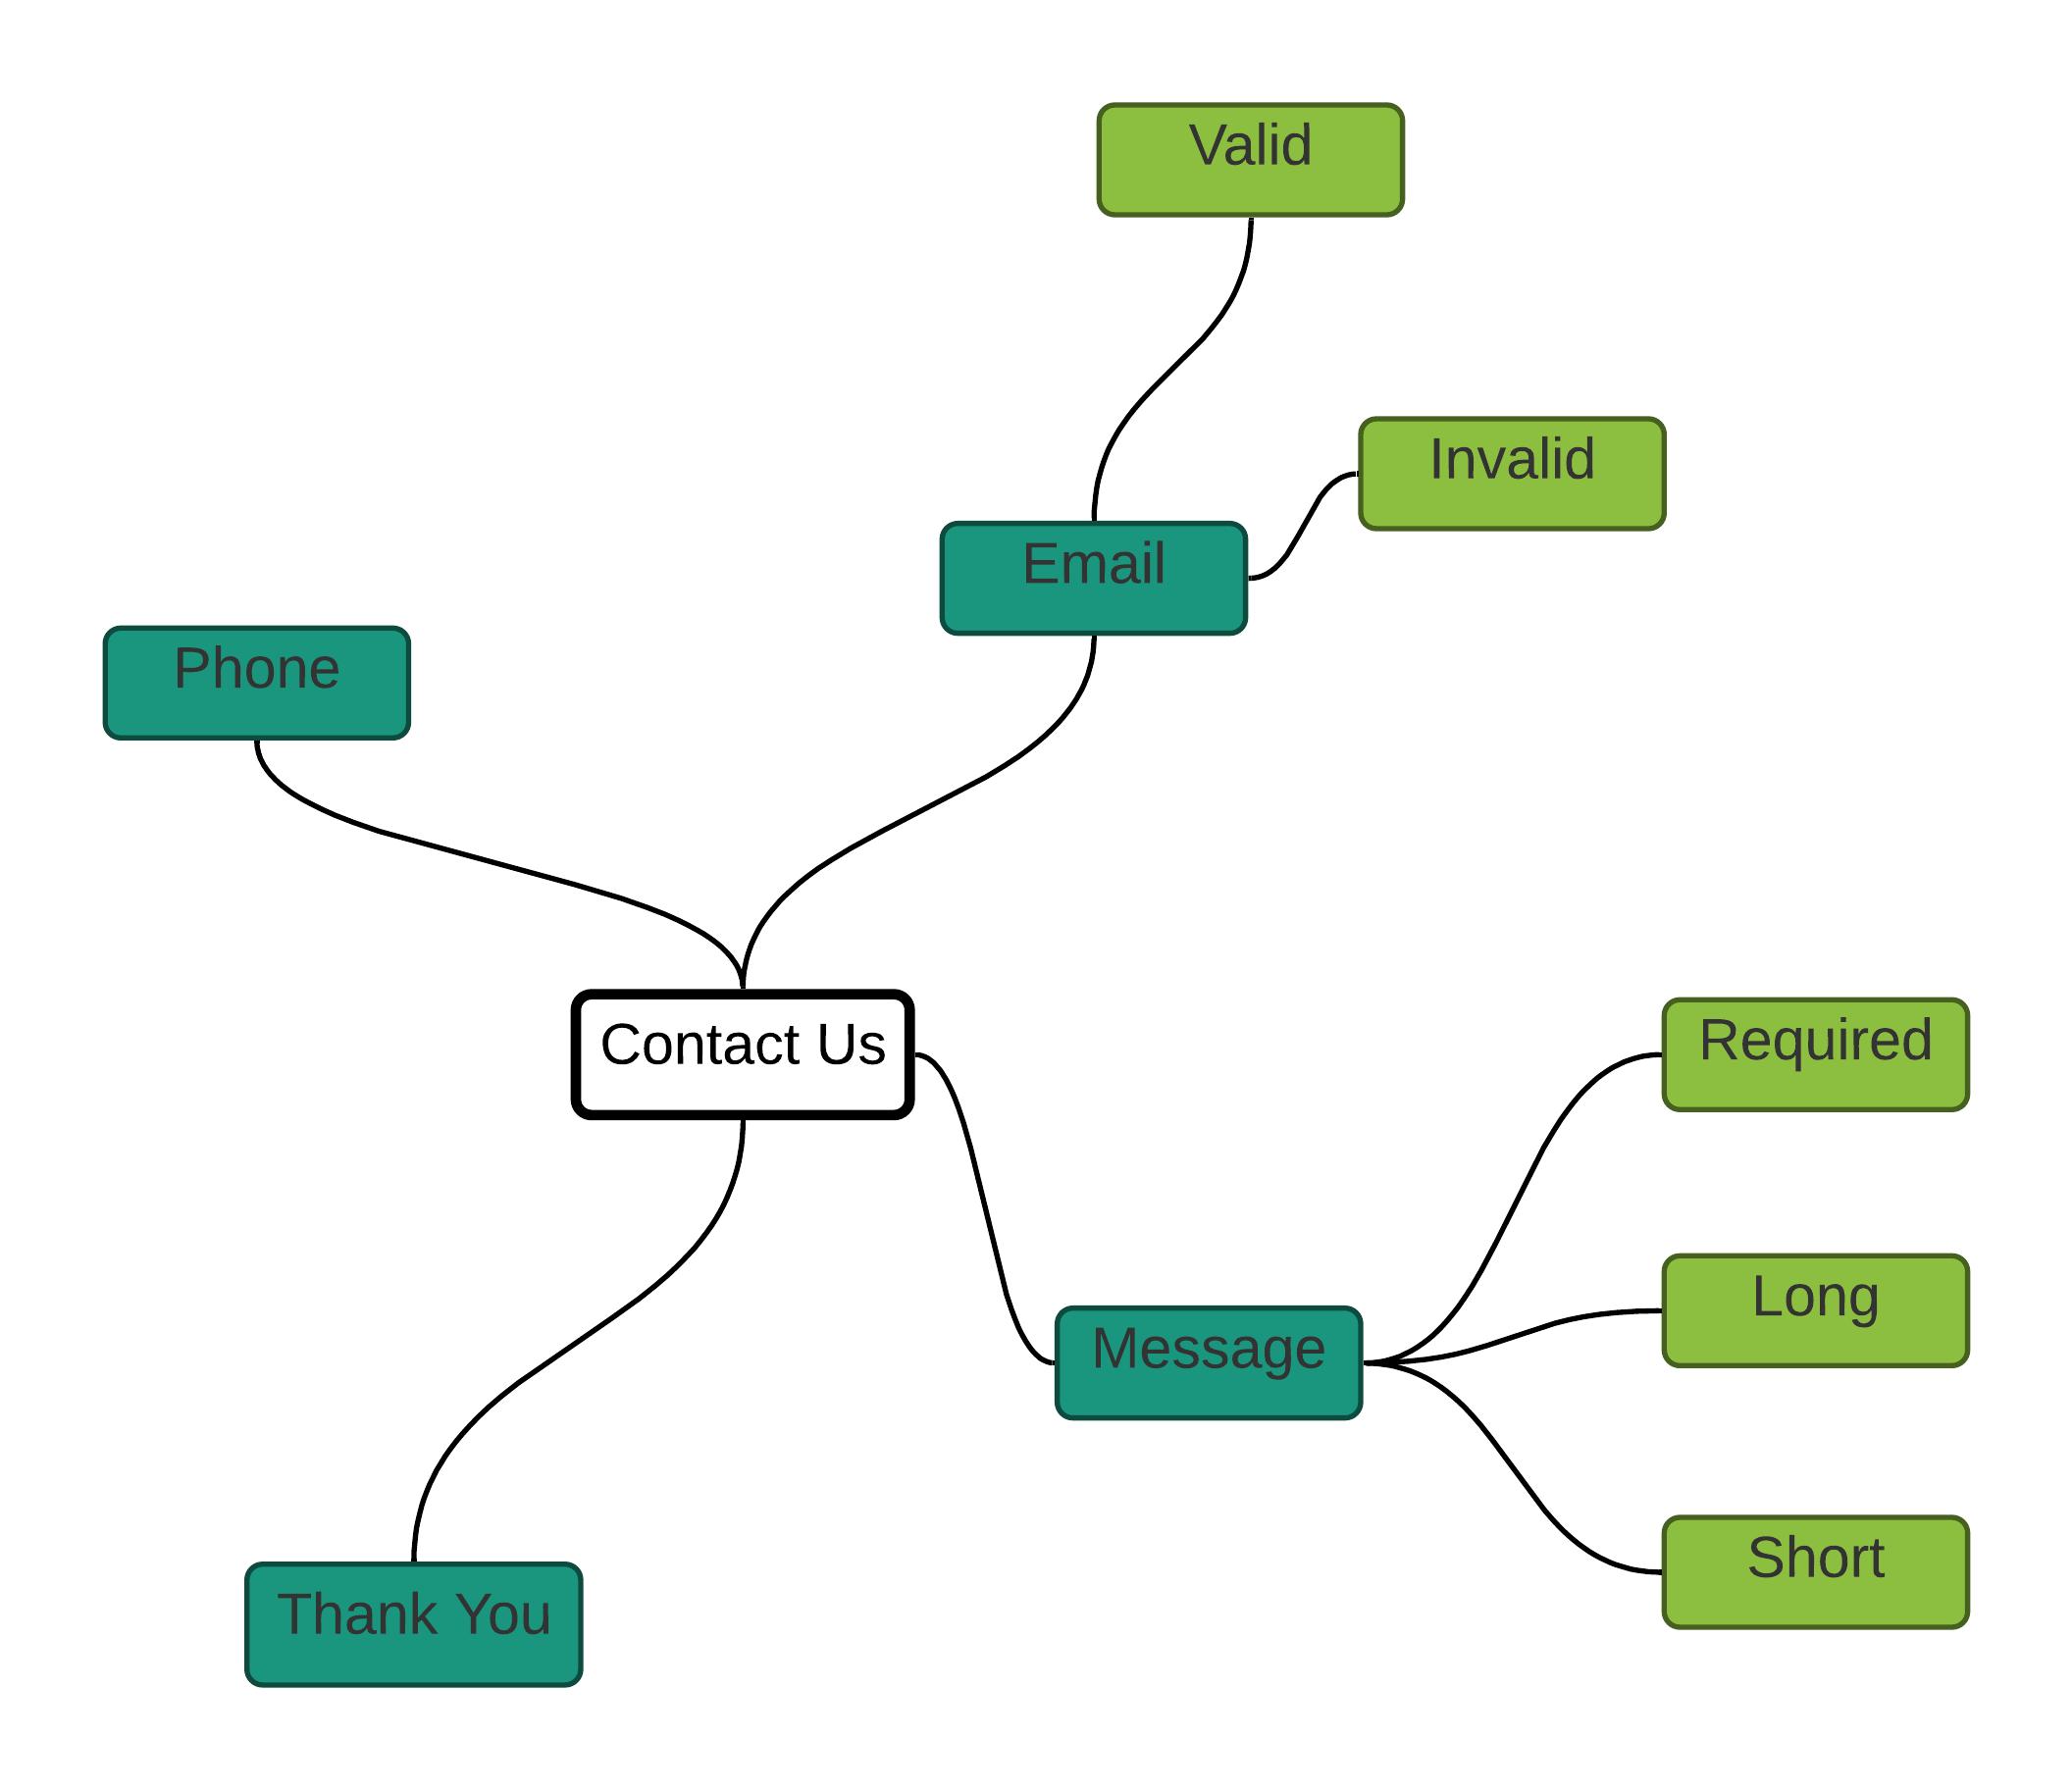 Exploratory Testing Documentation